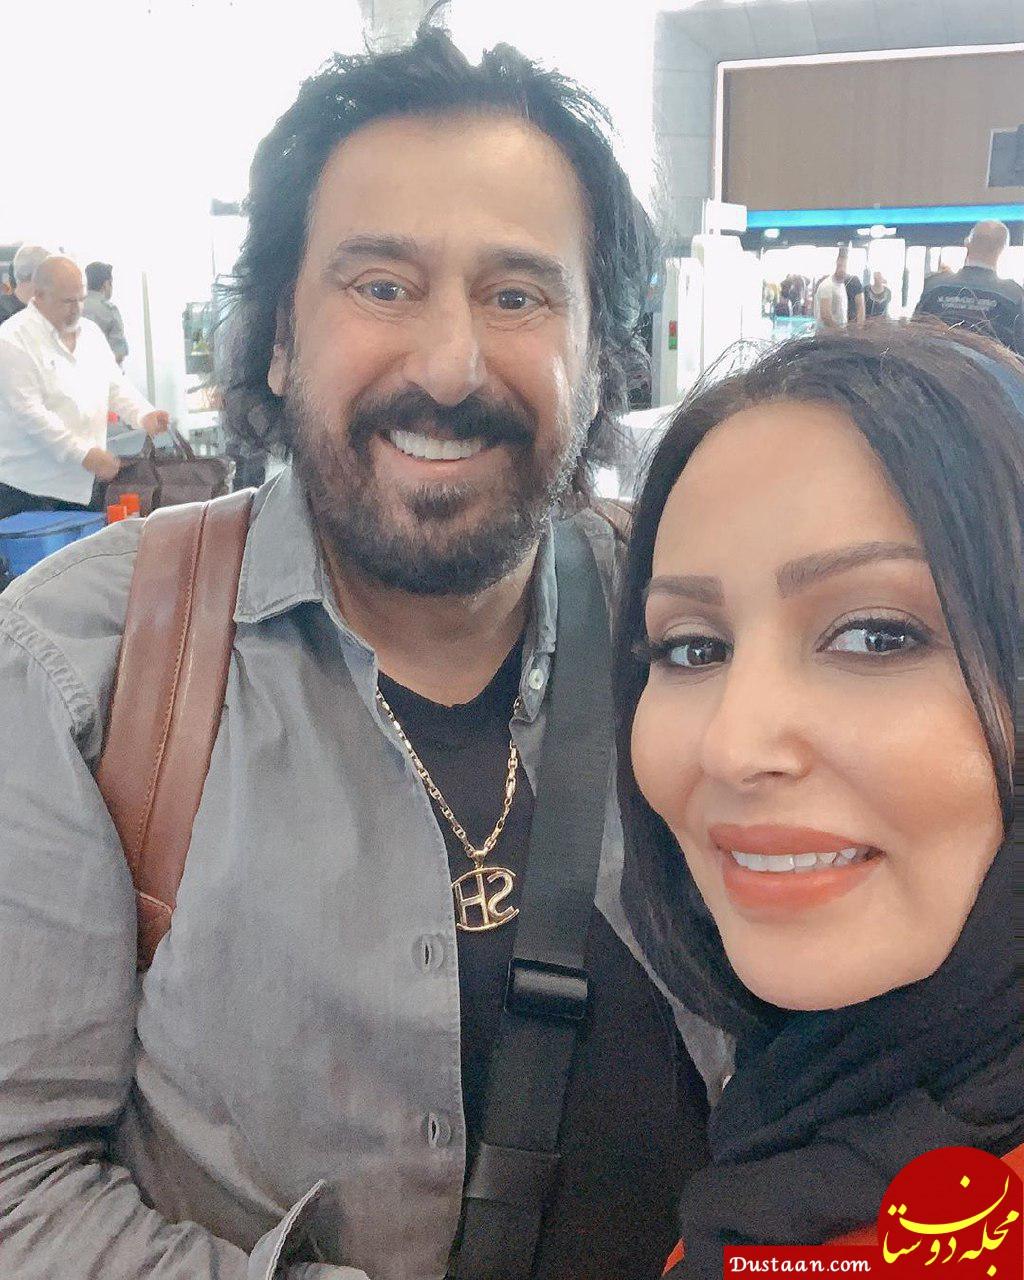 خوشحالی پرستو صالحی بخاطر دیدارش با خواننده لس آنجلسی! +عکس